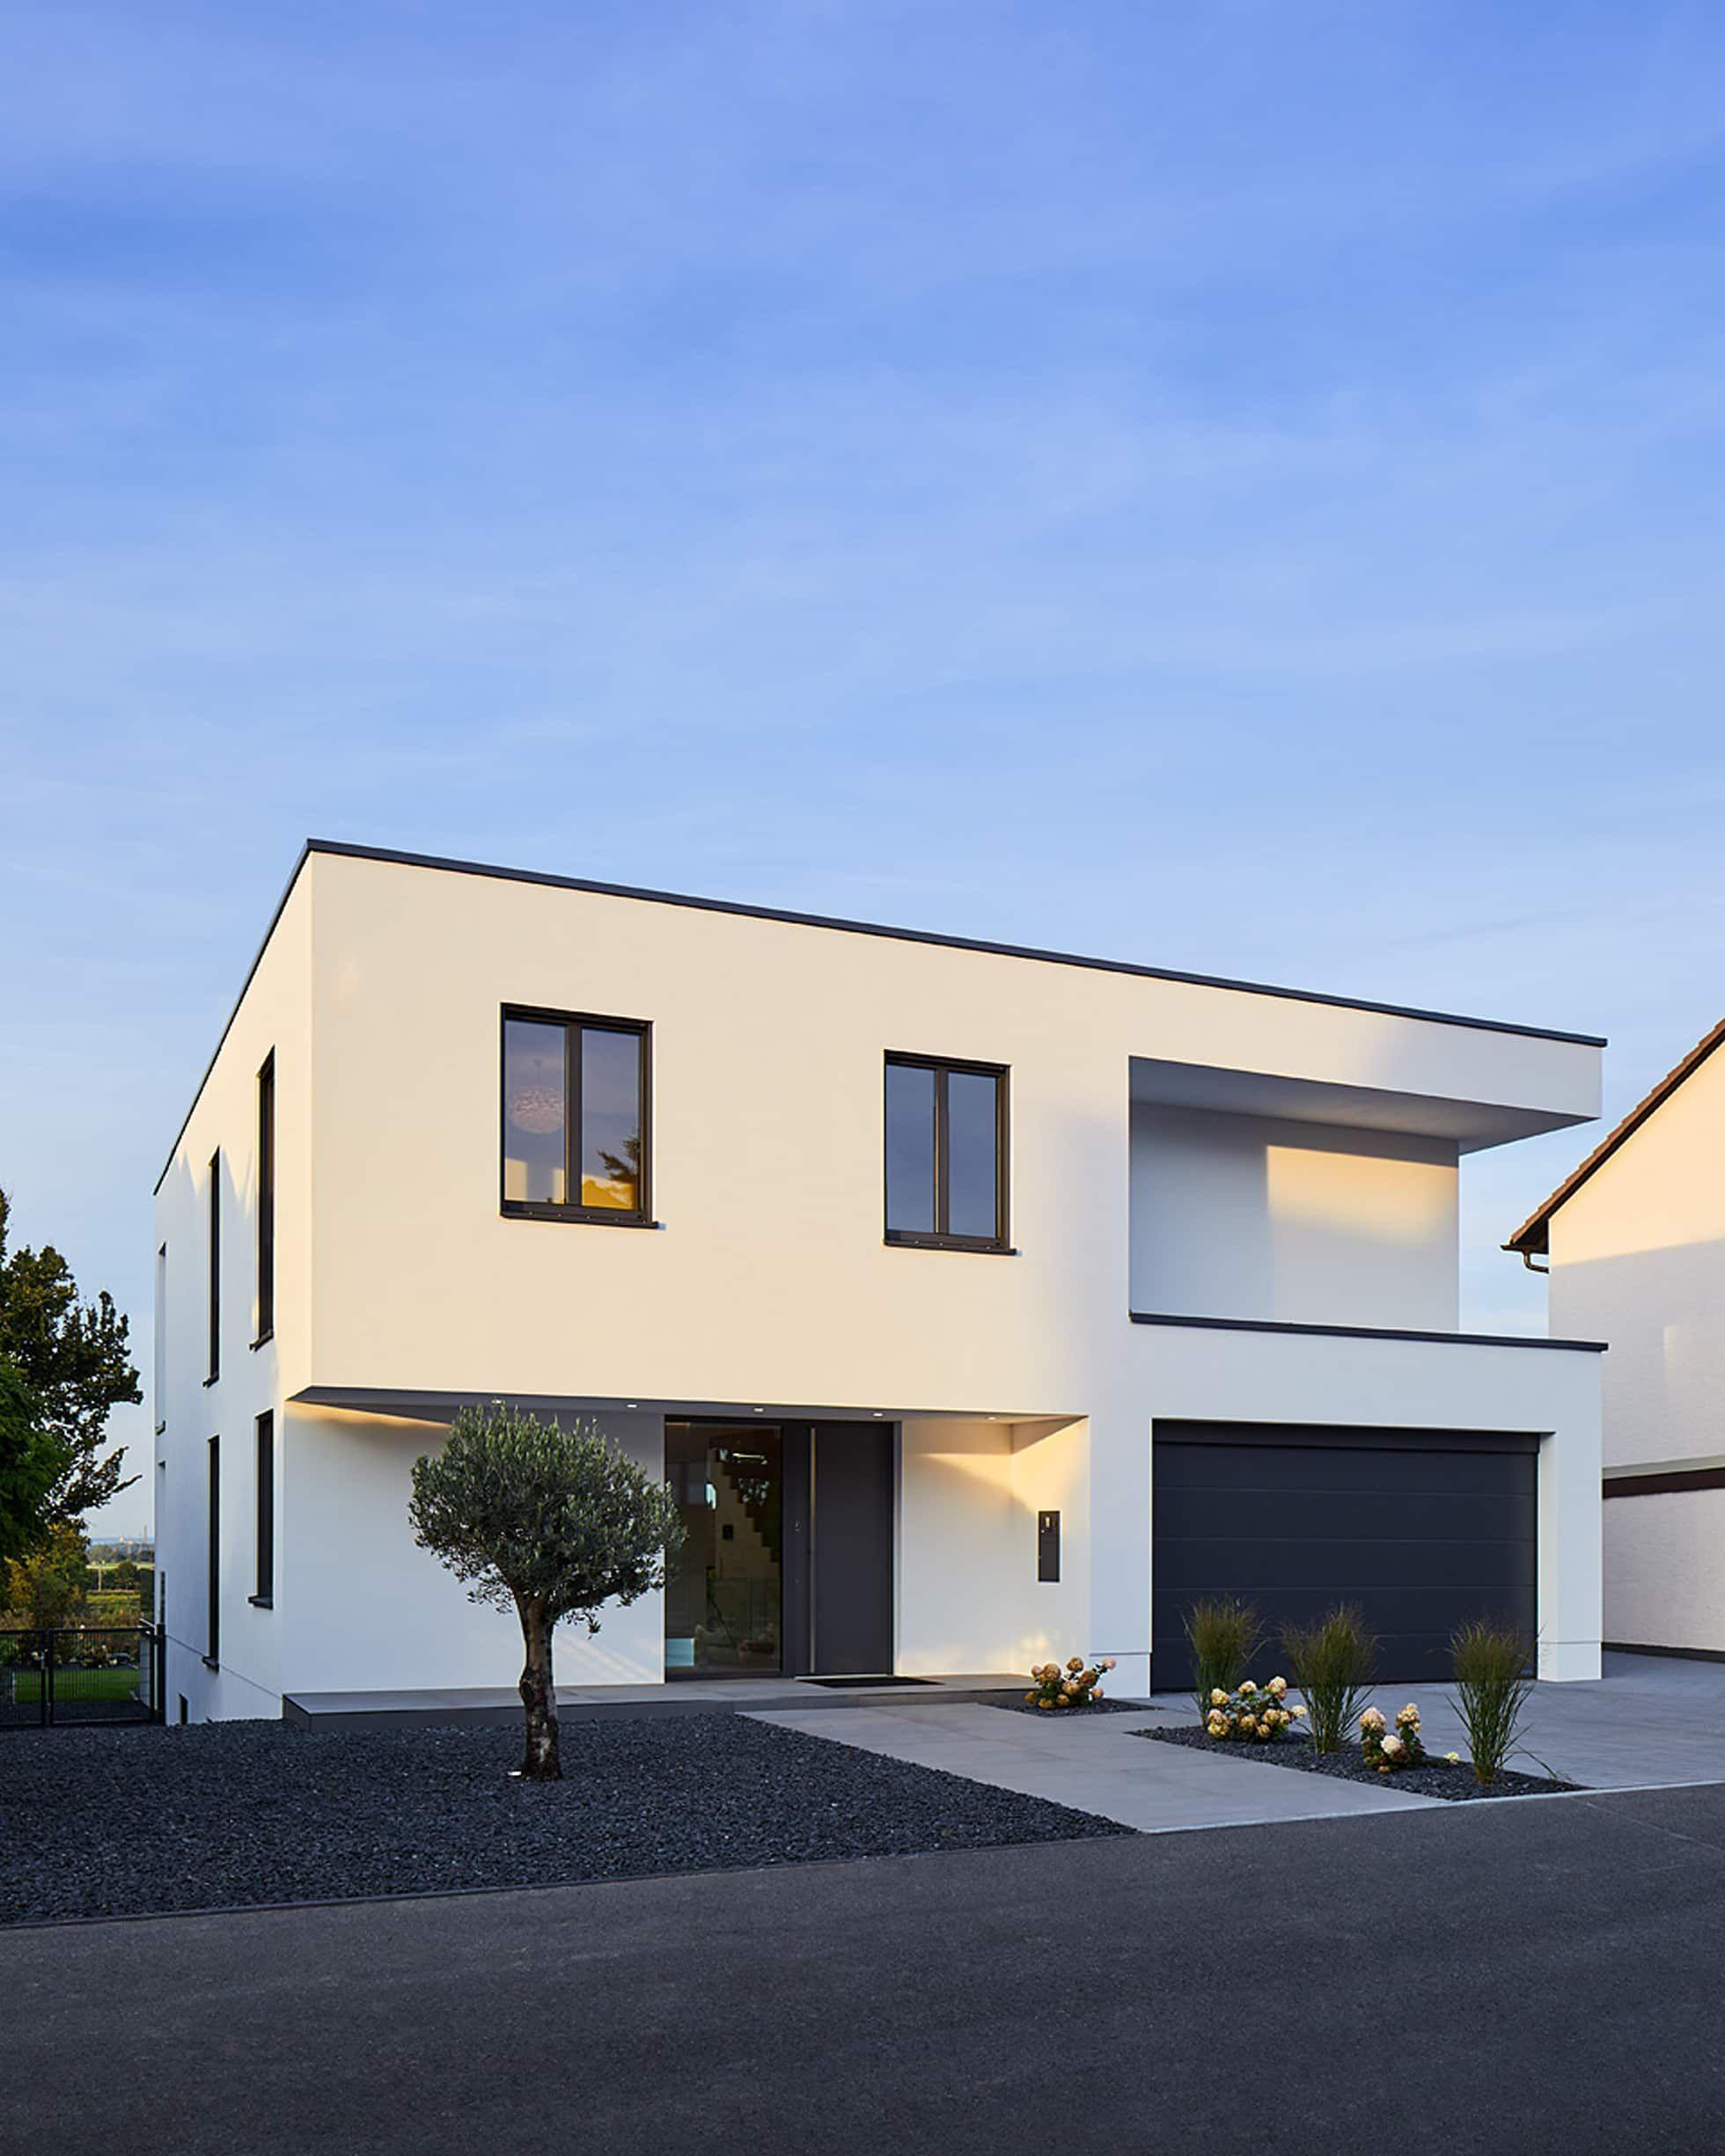 efh in bornheim h user von philip kistner fotografie home exterior pinterest house home. Black Bedroom Furniture Sets. Home Design Ideas